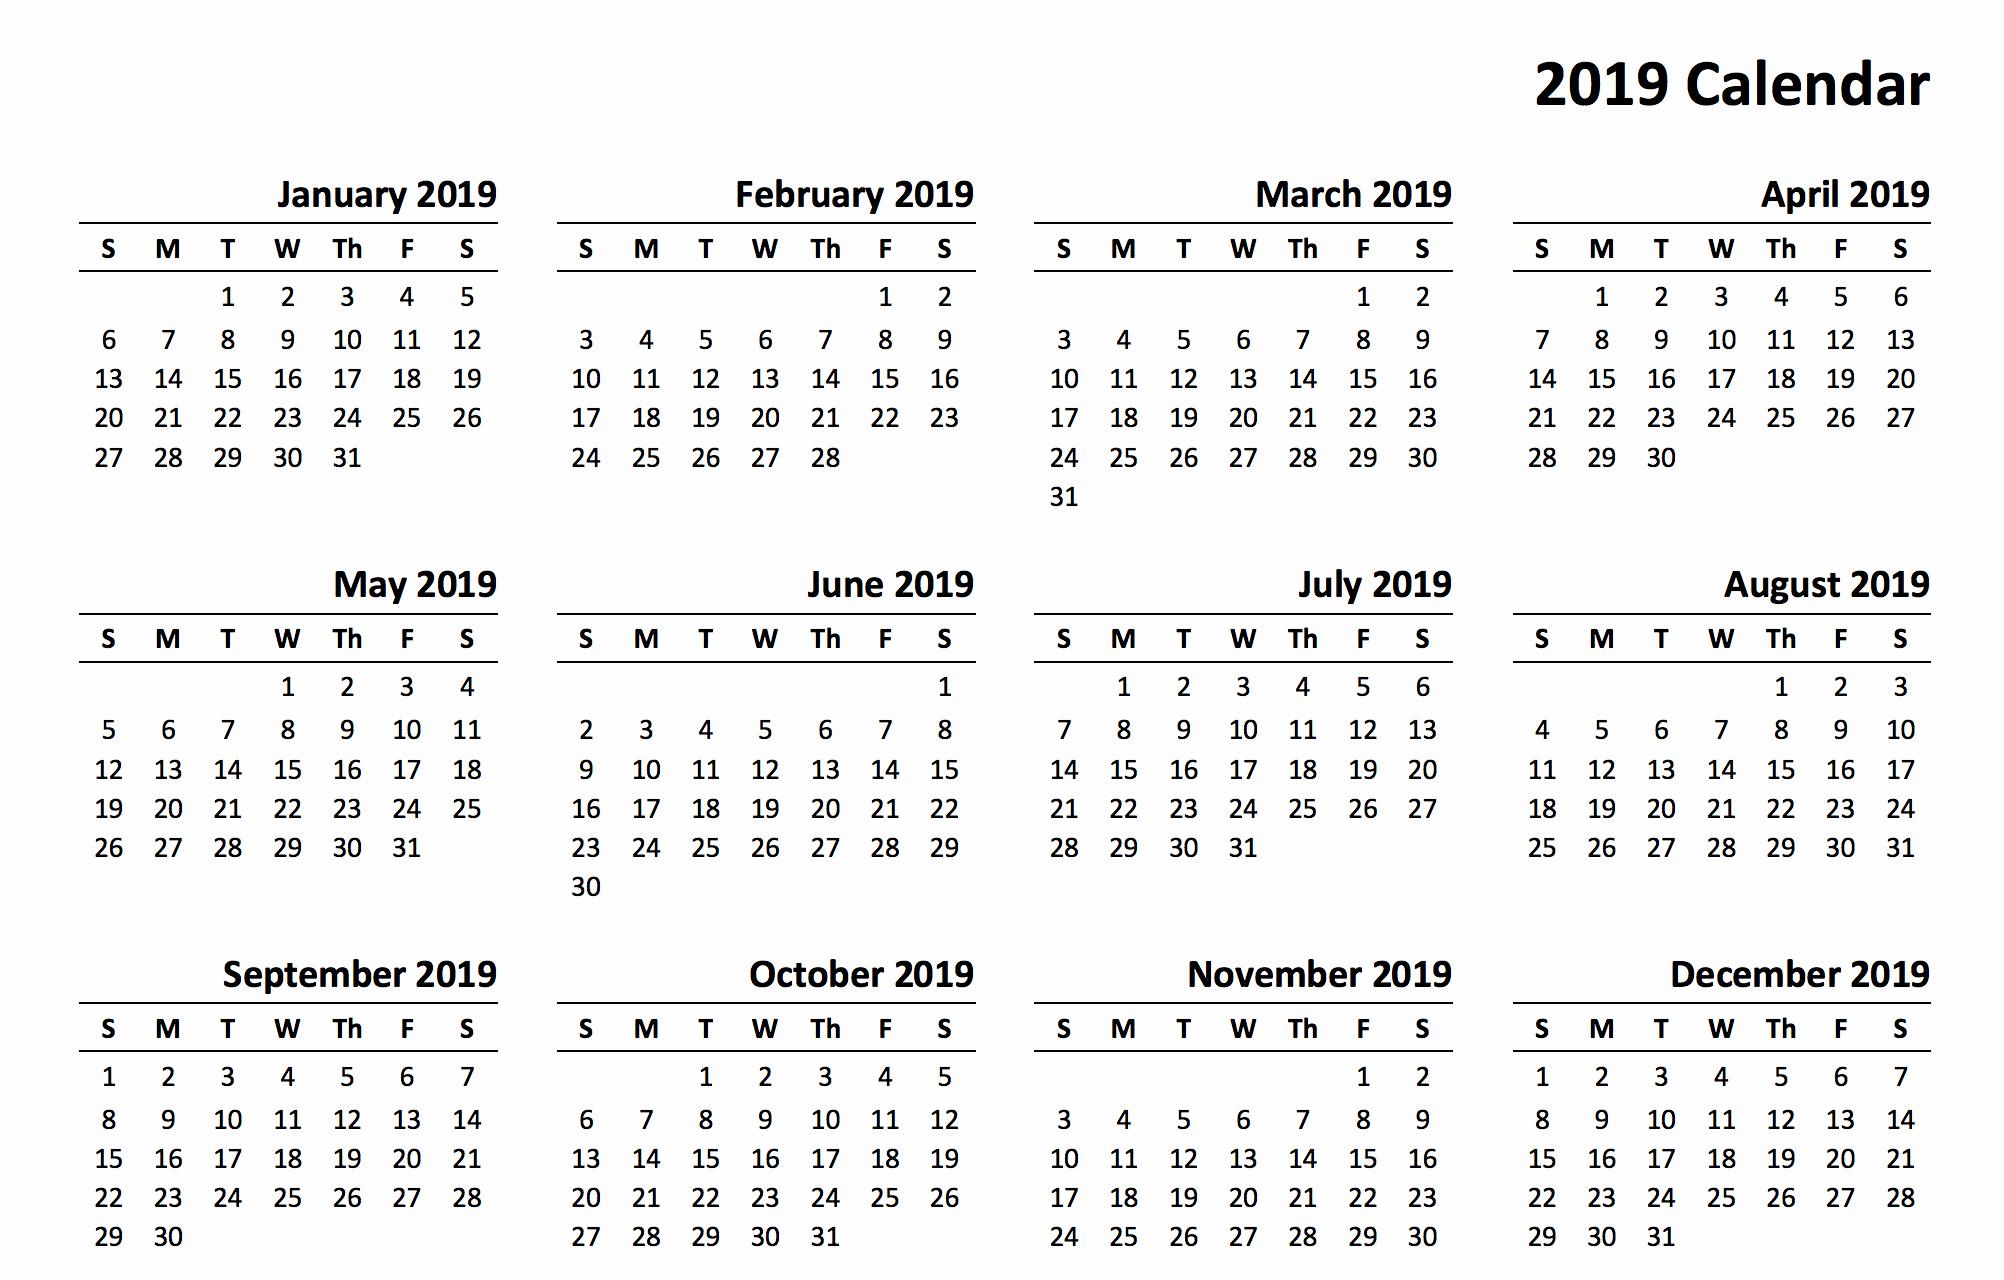 Free Printable 2019 Yearly Calendar Fresh 2019 Calendar Amazonaws